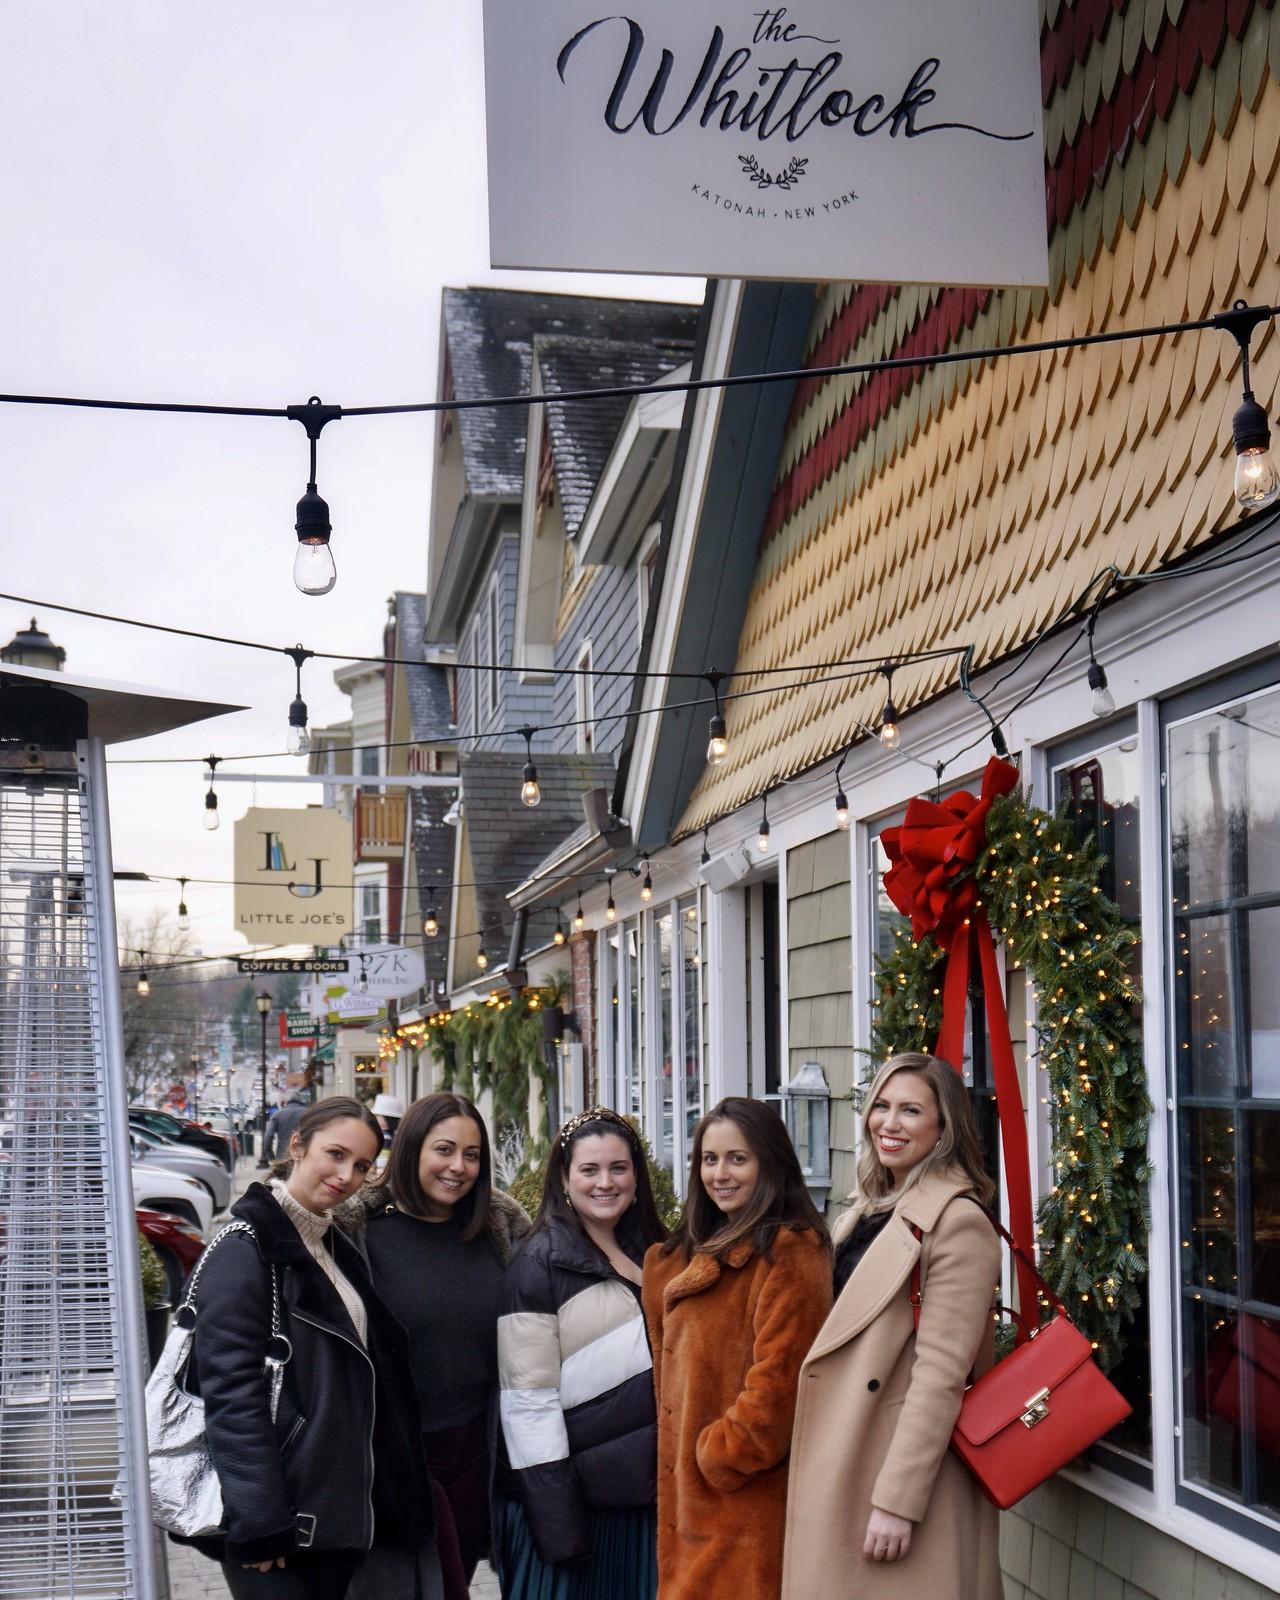 Westchester New York Bloggers Influencers The Whitlock Katonah New York